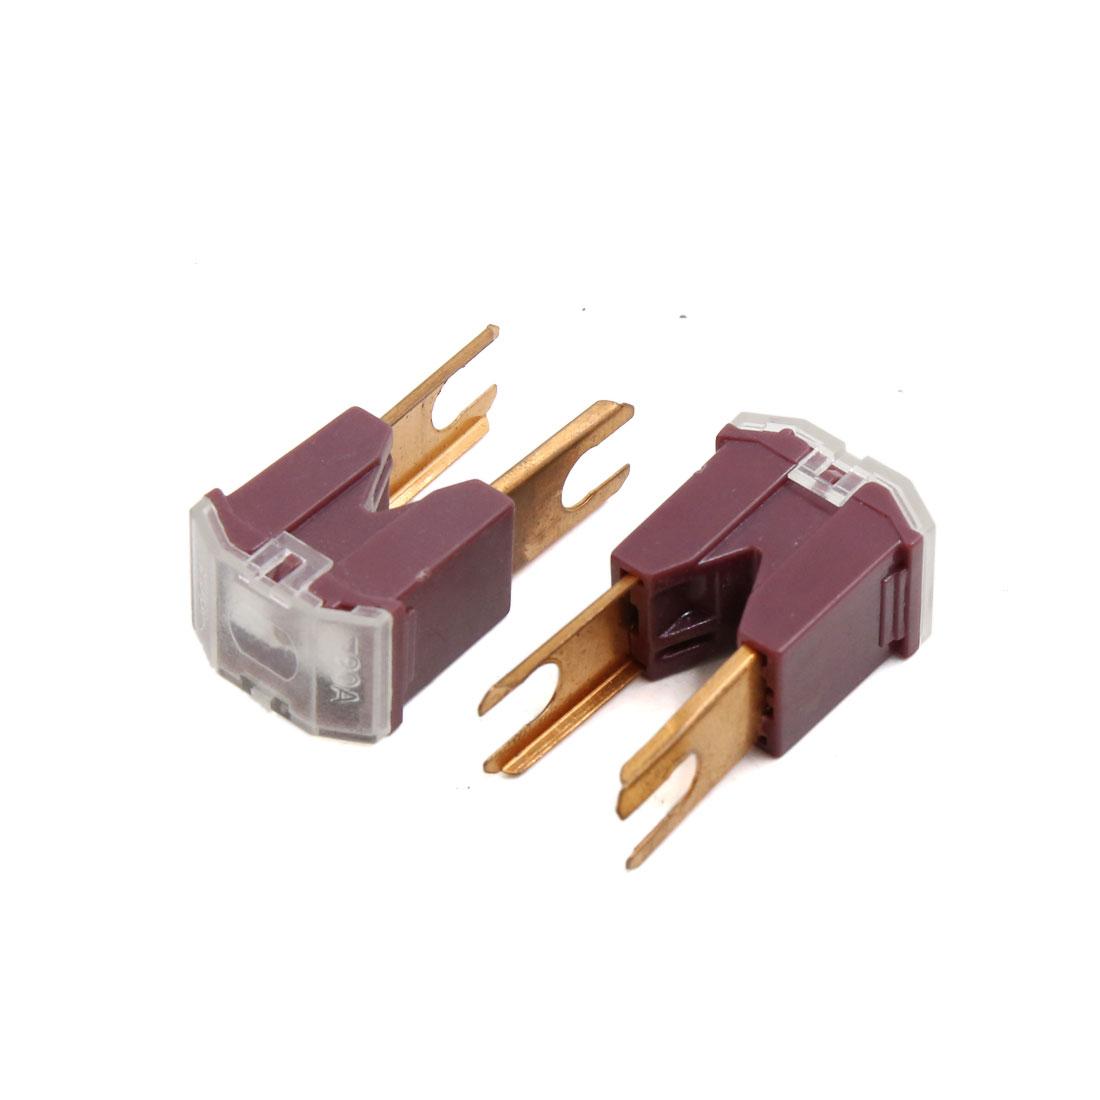 2pcs Purple Copper Tone 90A Straight Terminal Slow Blow Male PAL Fuse for Car